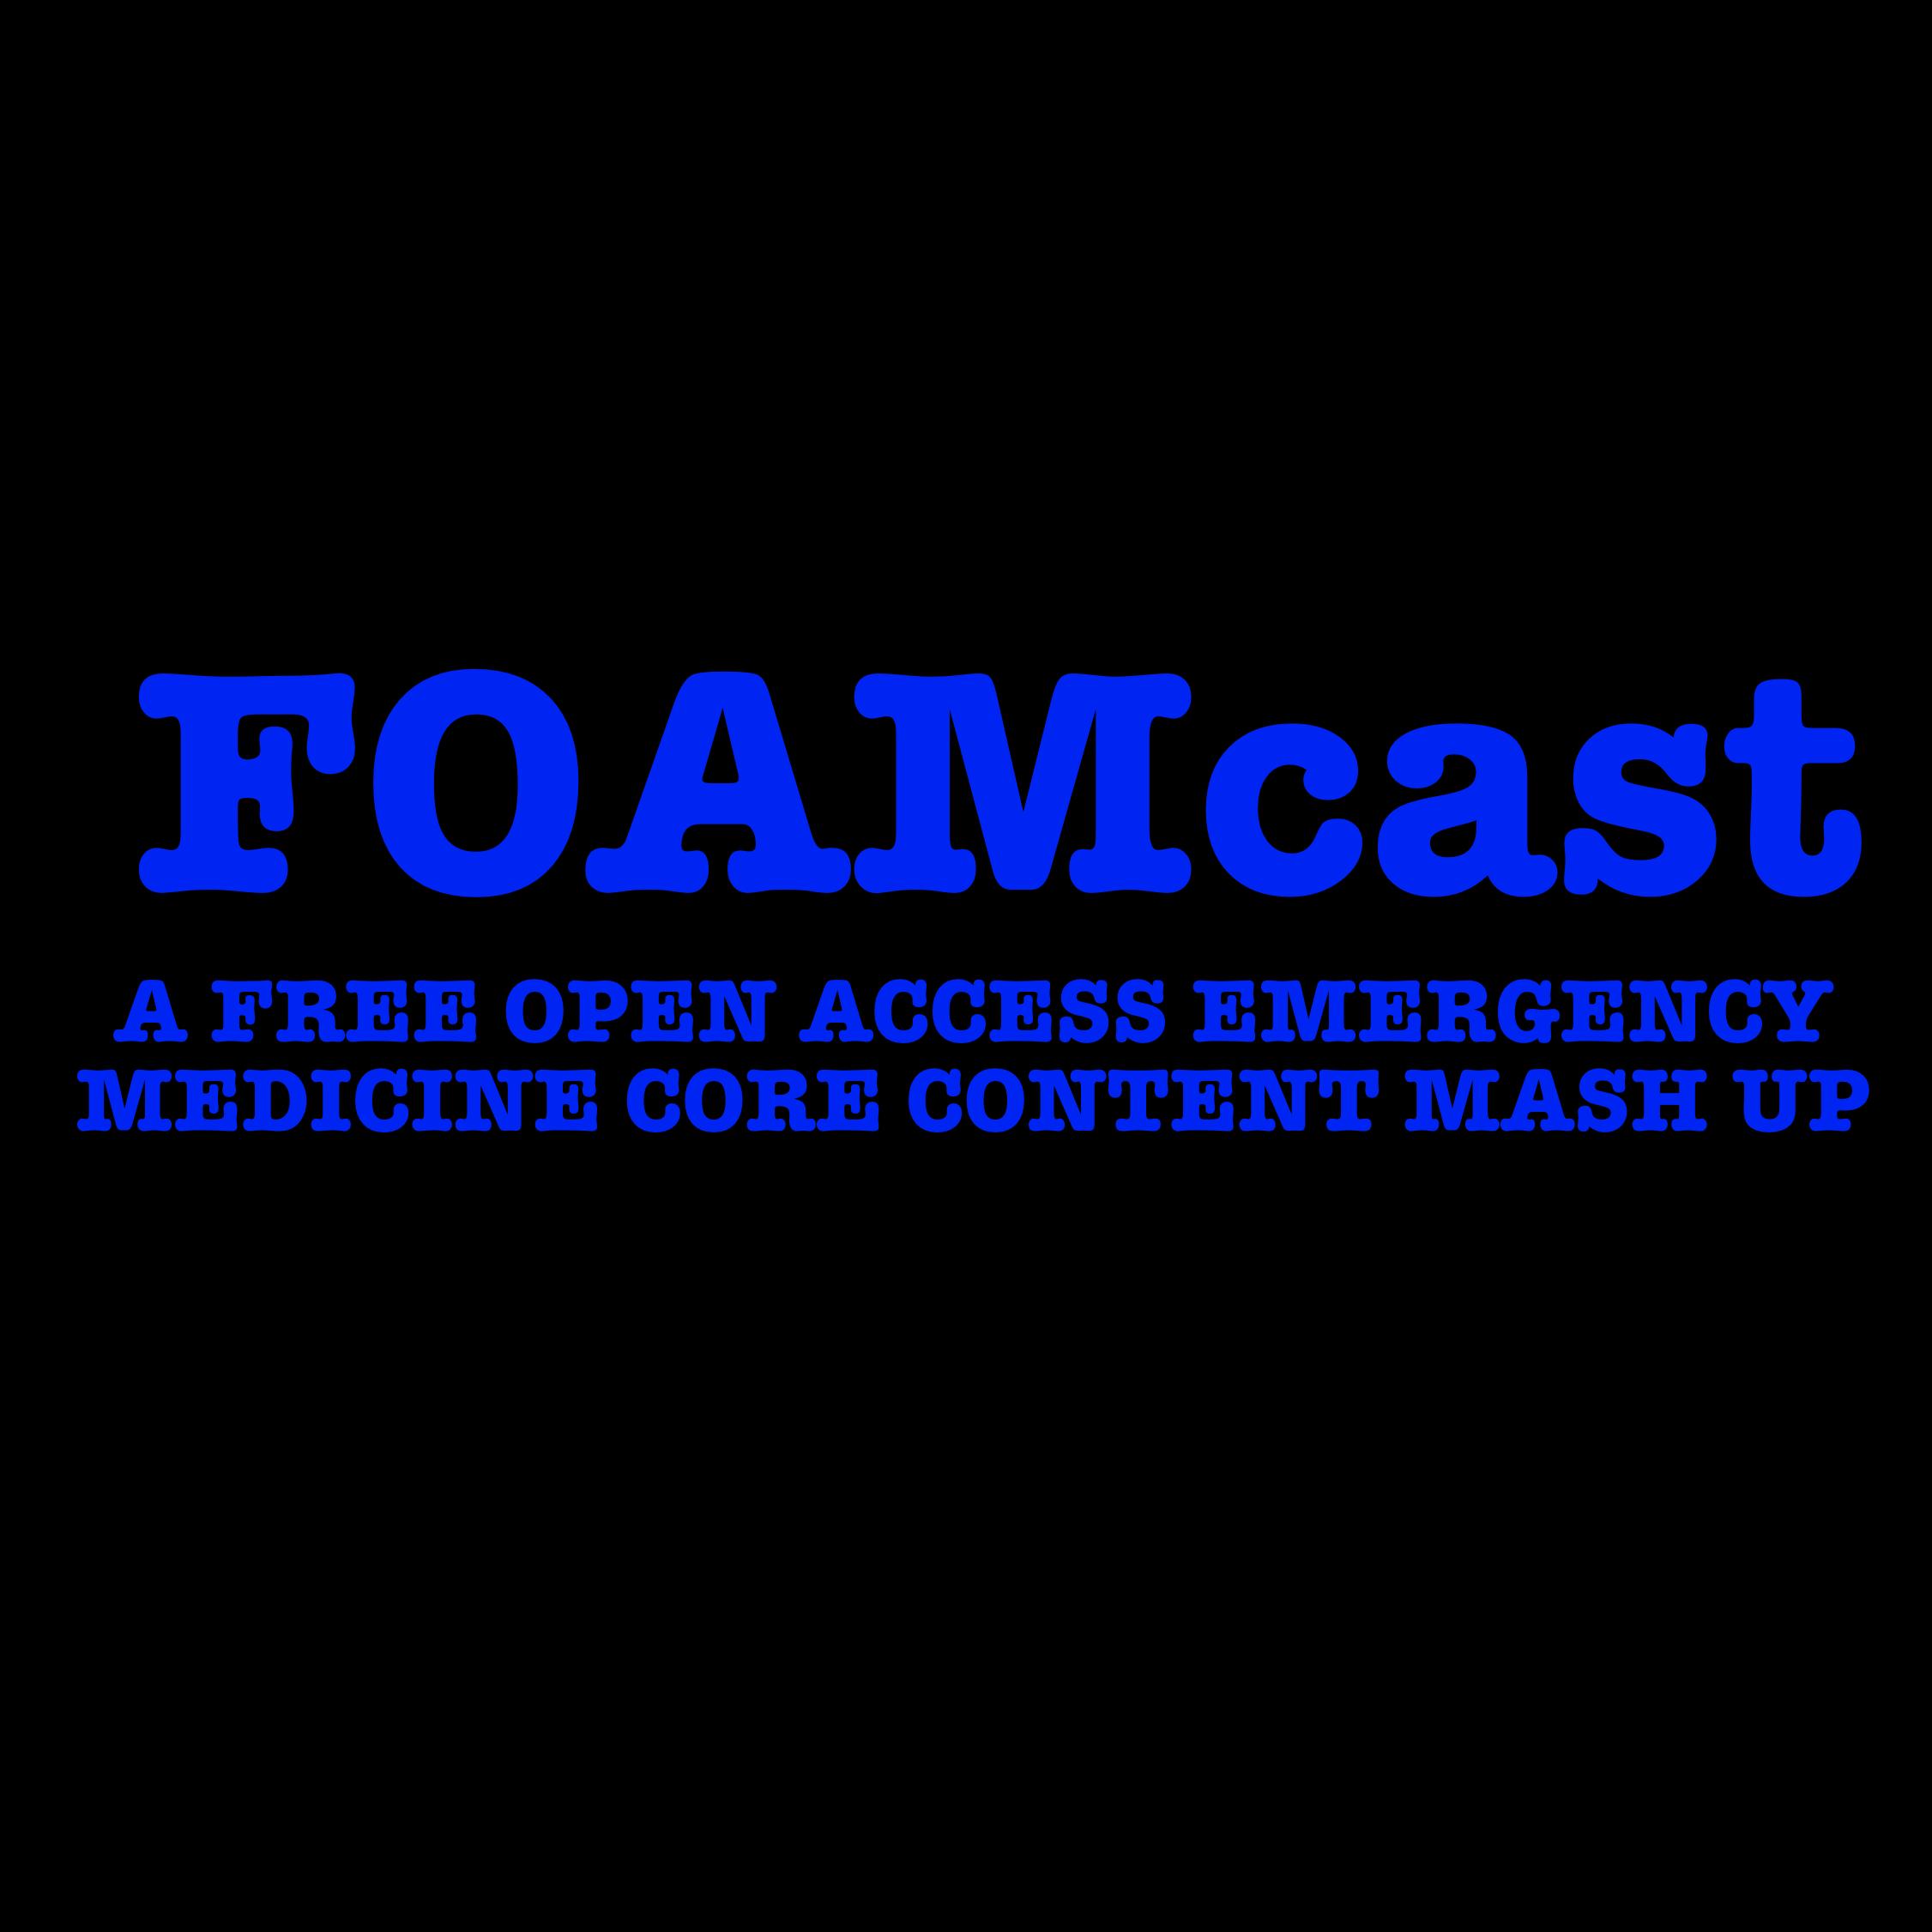 FOAMcast | A Free Open Access Emergency Medicine-Core Content Mash Up